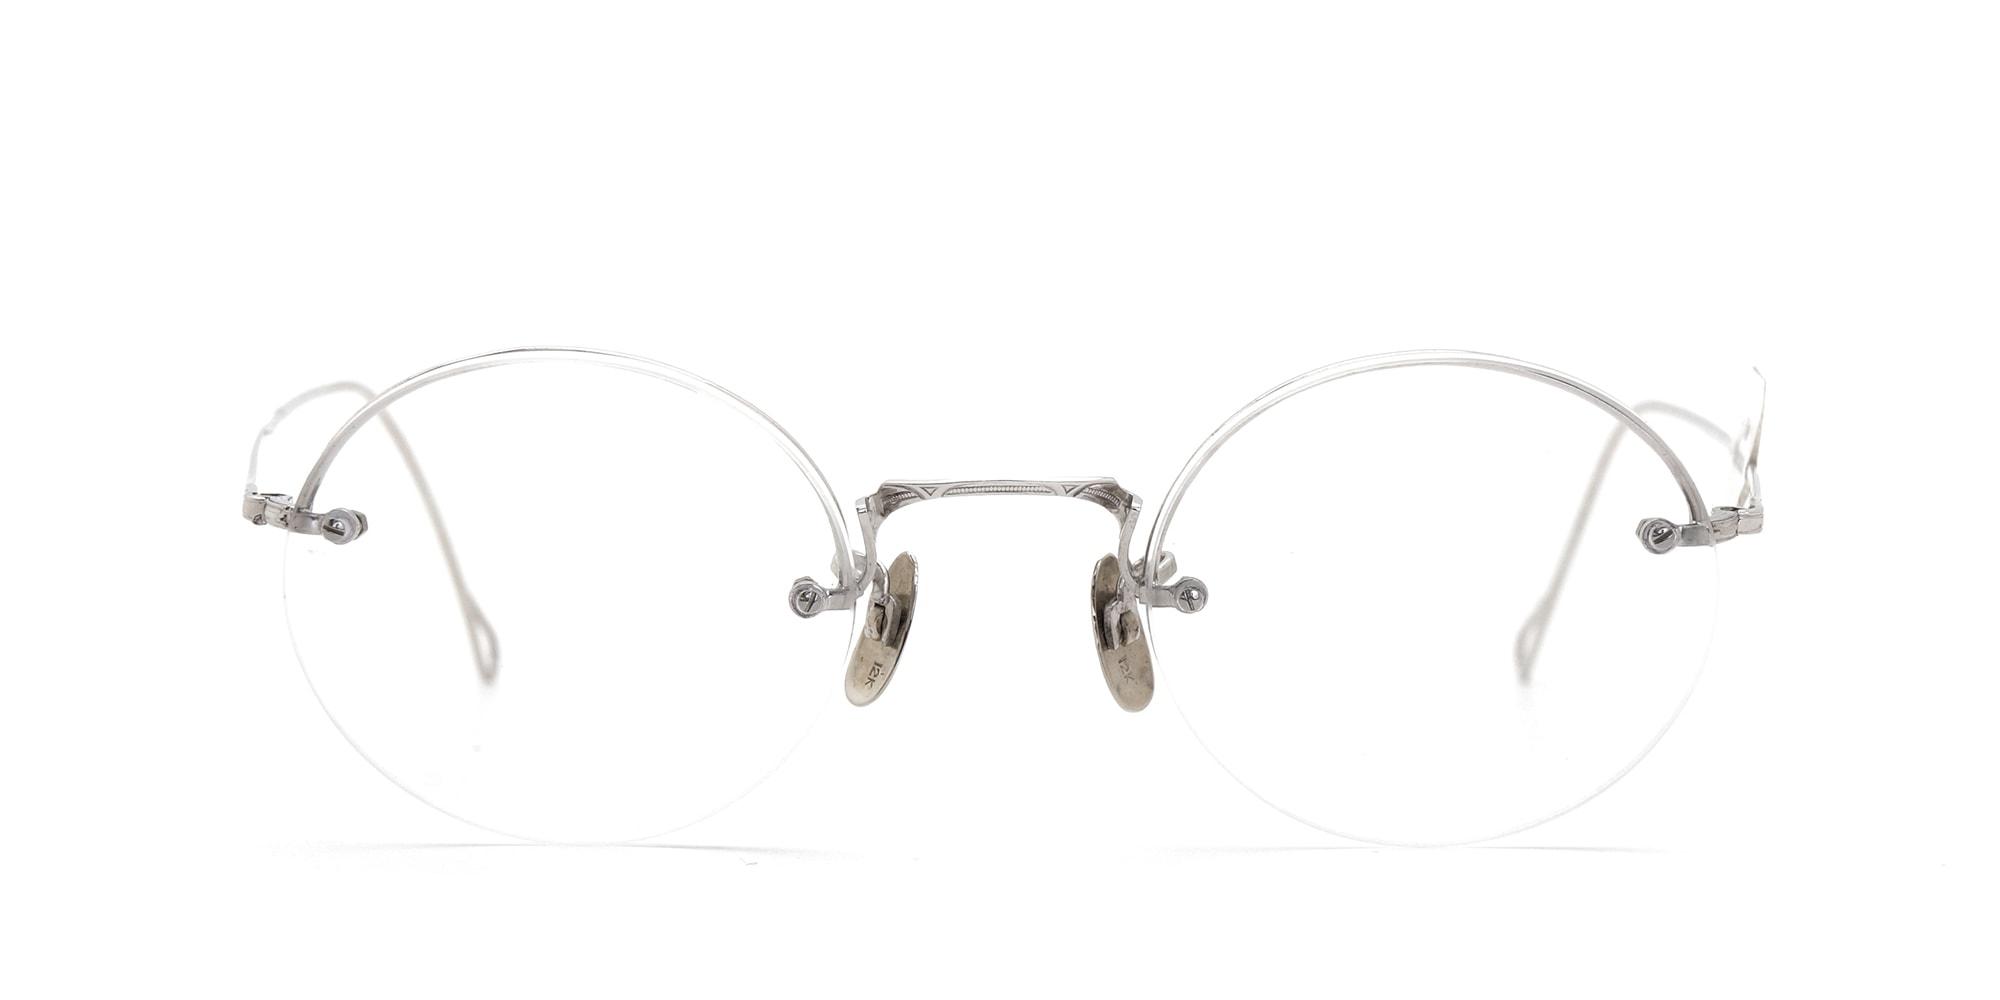 The Spectacle メガネ 1942年 SHURON Rimway Ful-Vue 1/10 12KGF 42-Long イメージ3